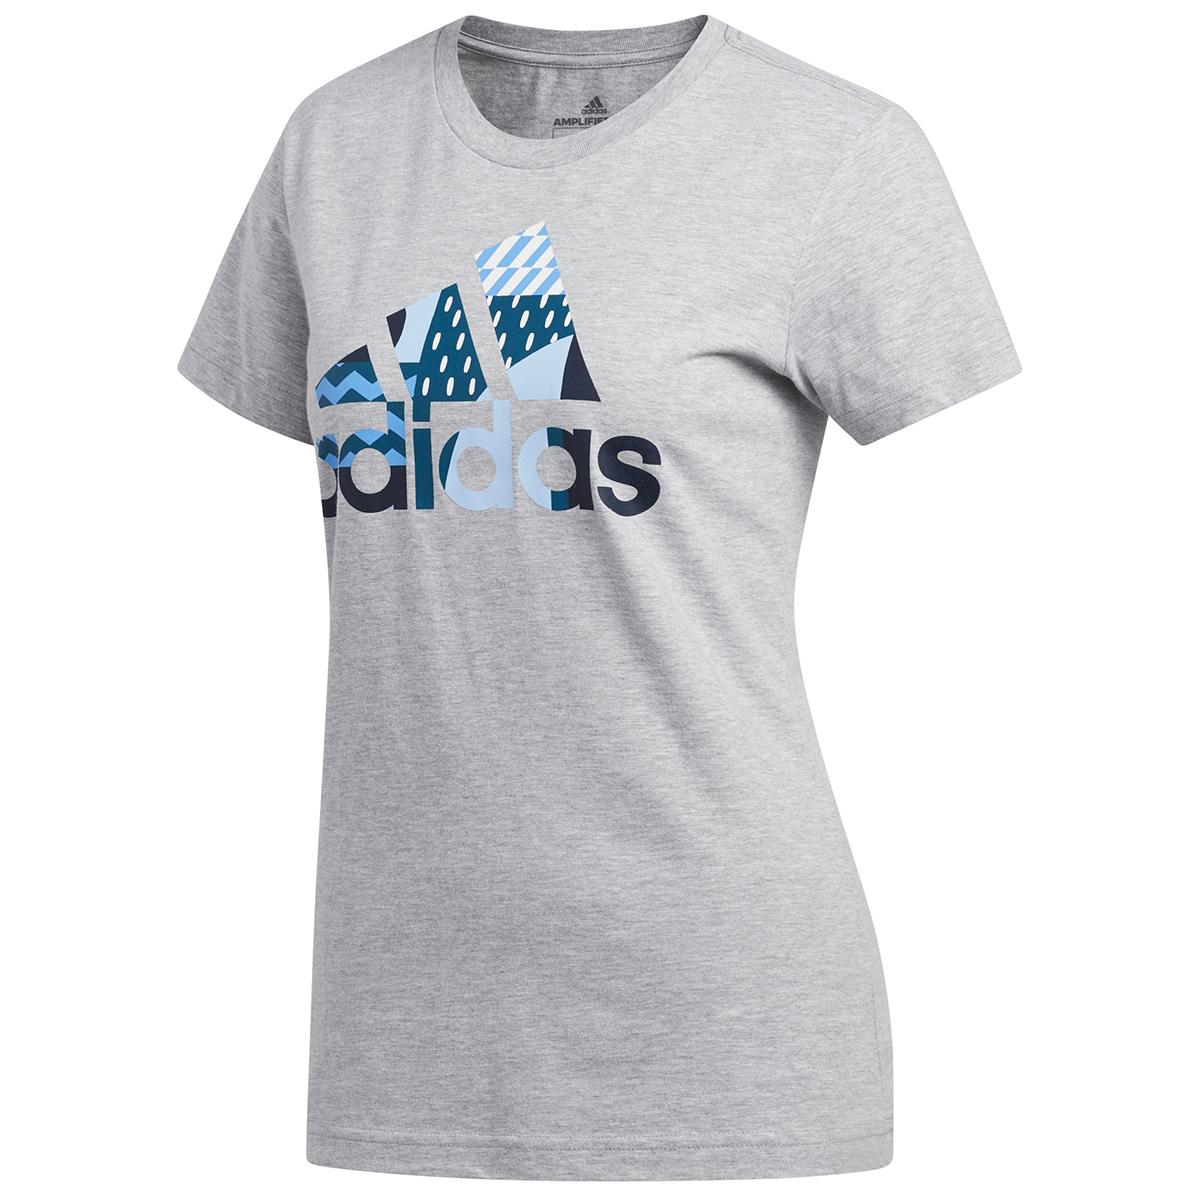 Adidas Women's Global Citizens Badge Of Sport Tee - Black, L